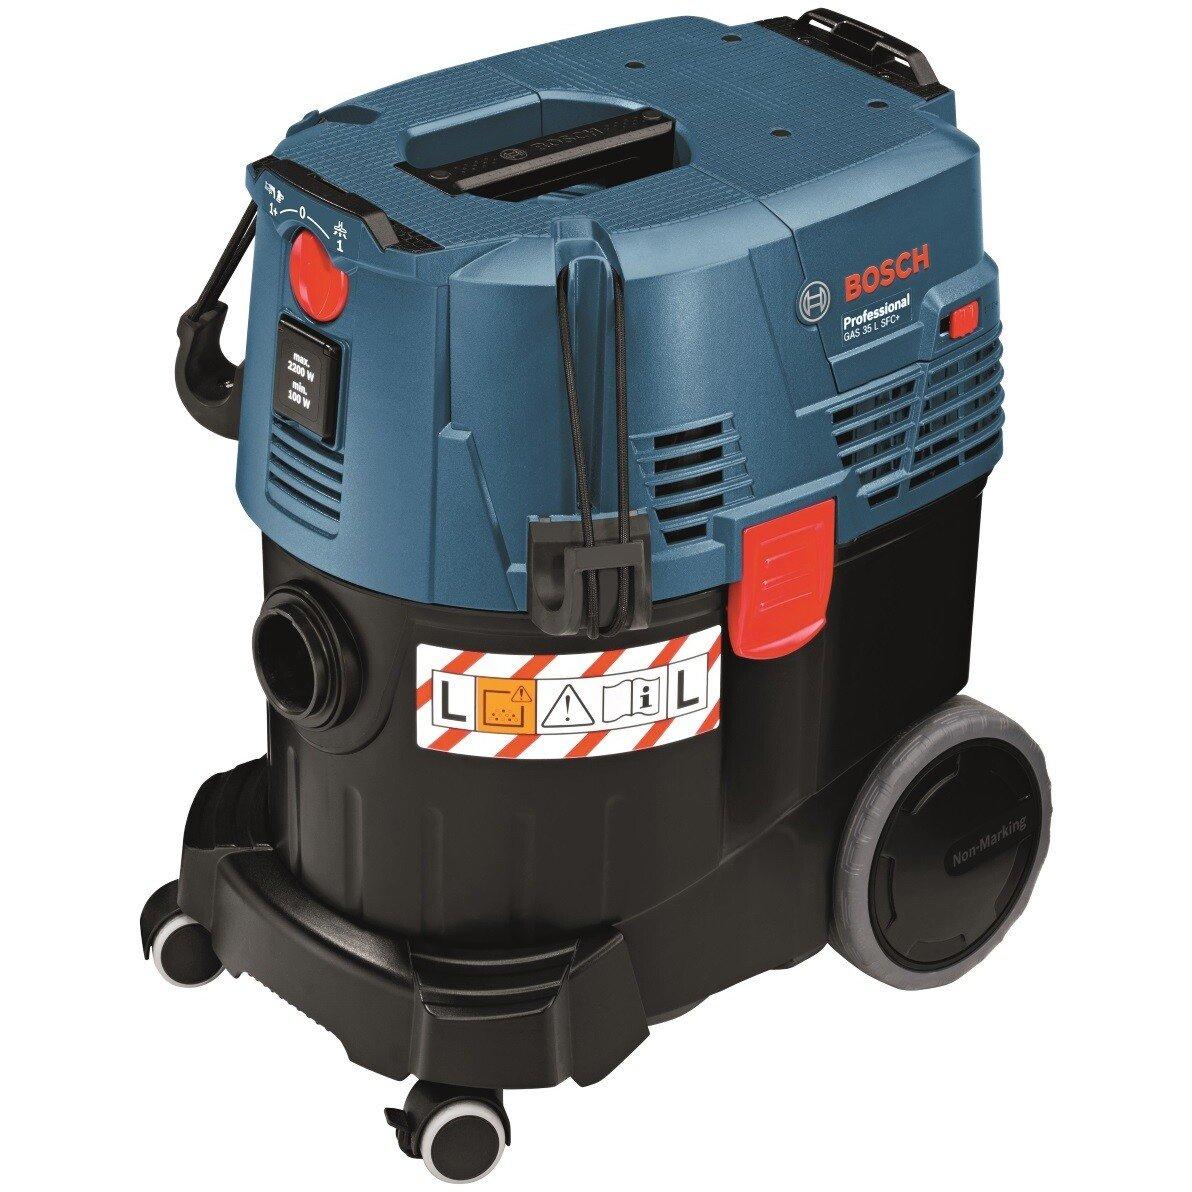 Bosch Gas 20 Sfc Wet And Dry Vacuum Cleaner Daftar Harga Terbaru High Pressure Listrik Ghp 5 55 35 L Ltr Class Dust Extractor